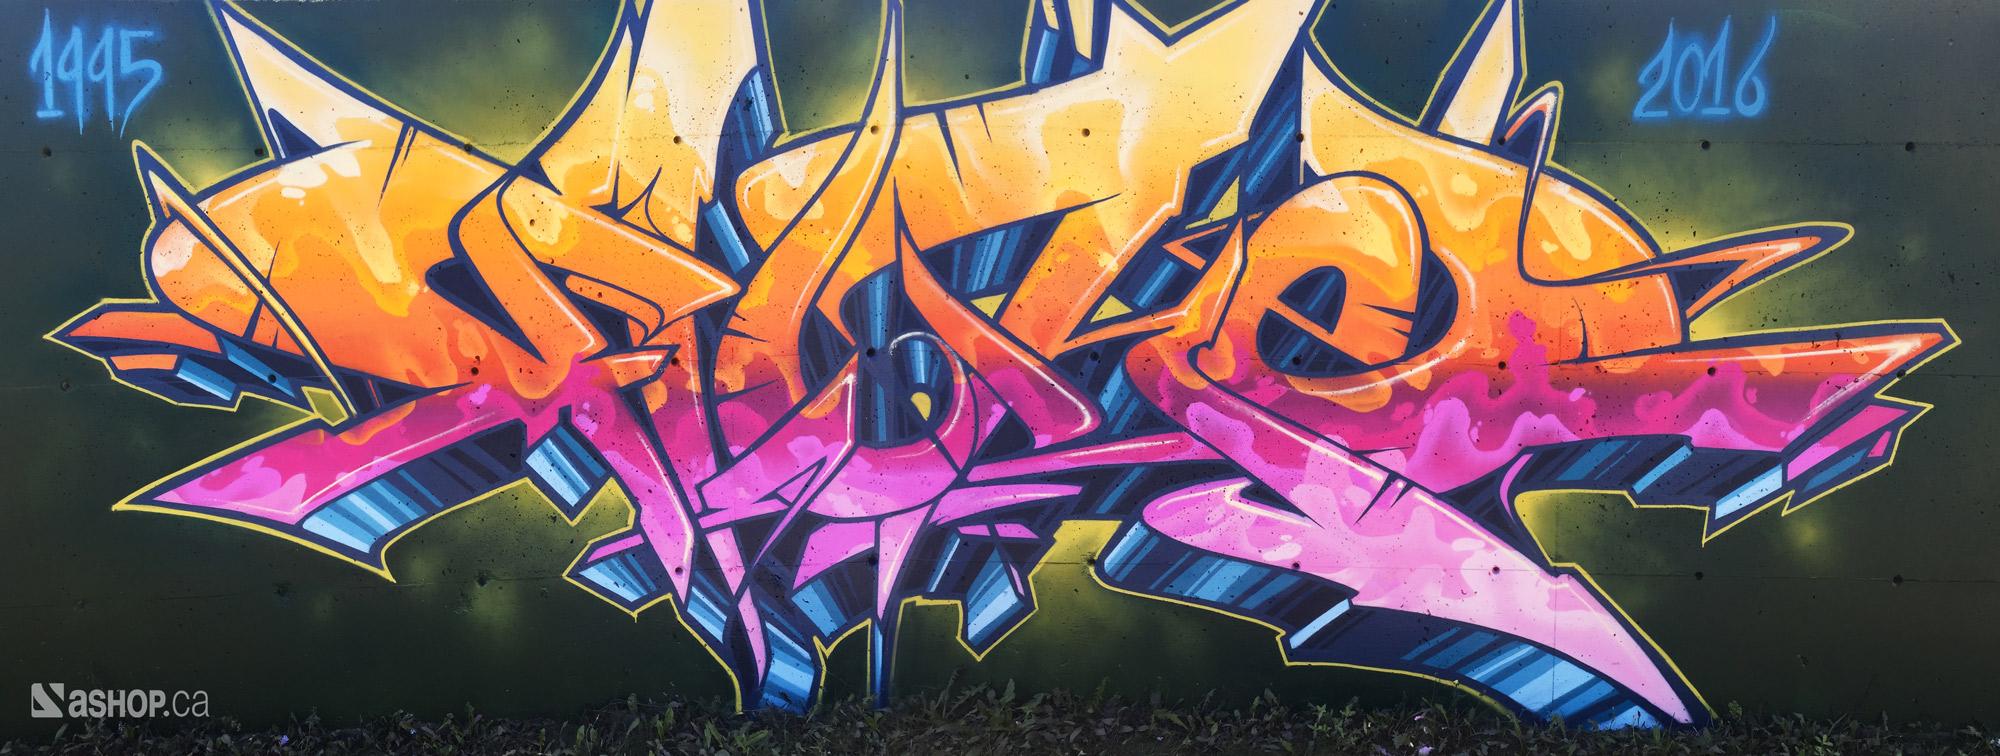 fluke_ashop_a'shop_mural_murales_graffiti_street_art_montreal_paint_cheminvert_WEB.jpg